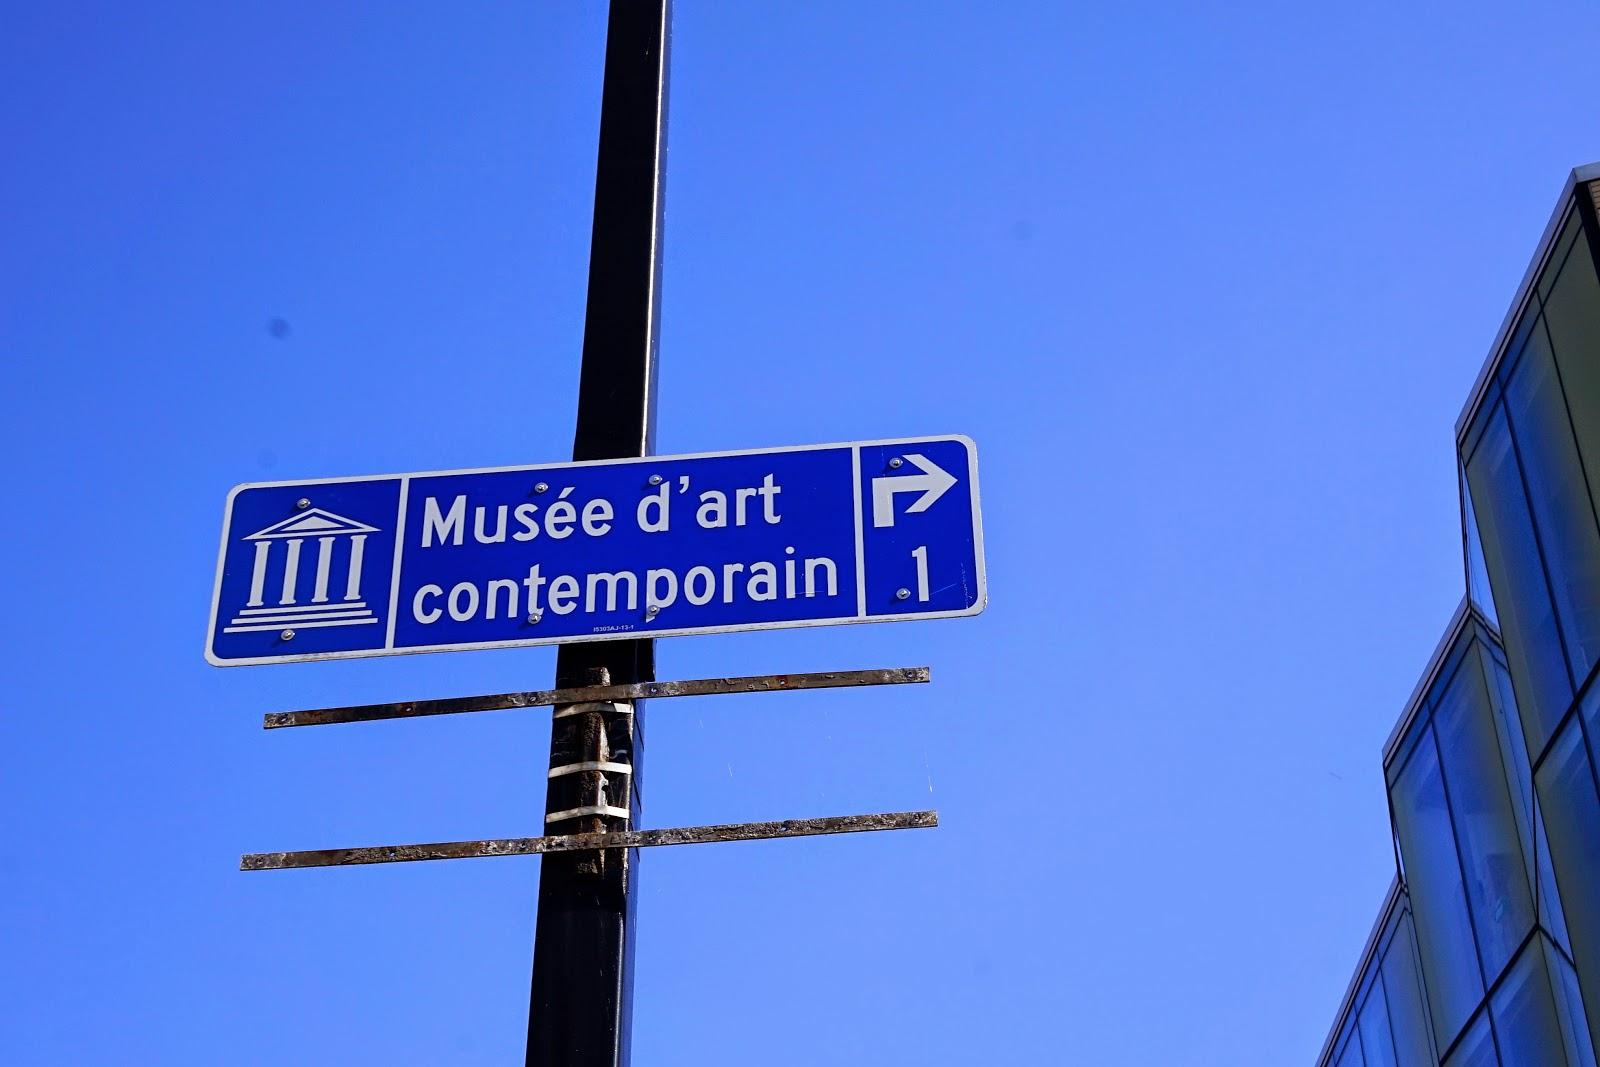 musee d'art contemporain